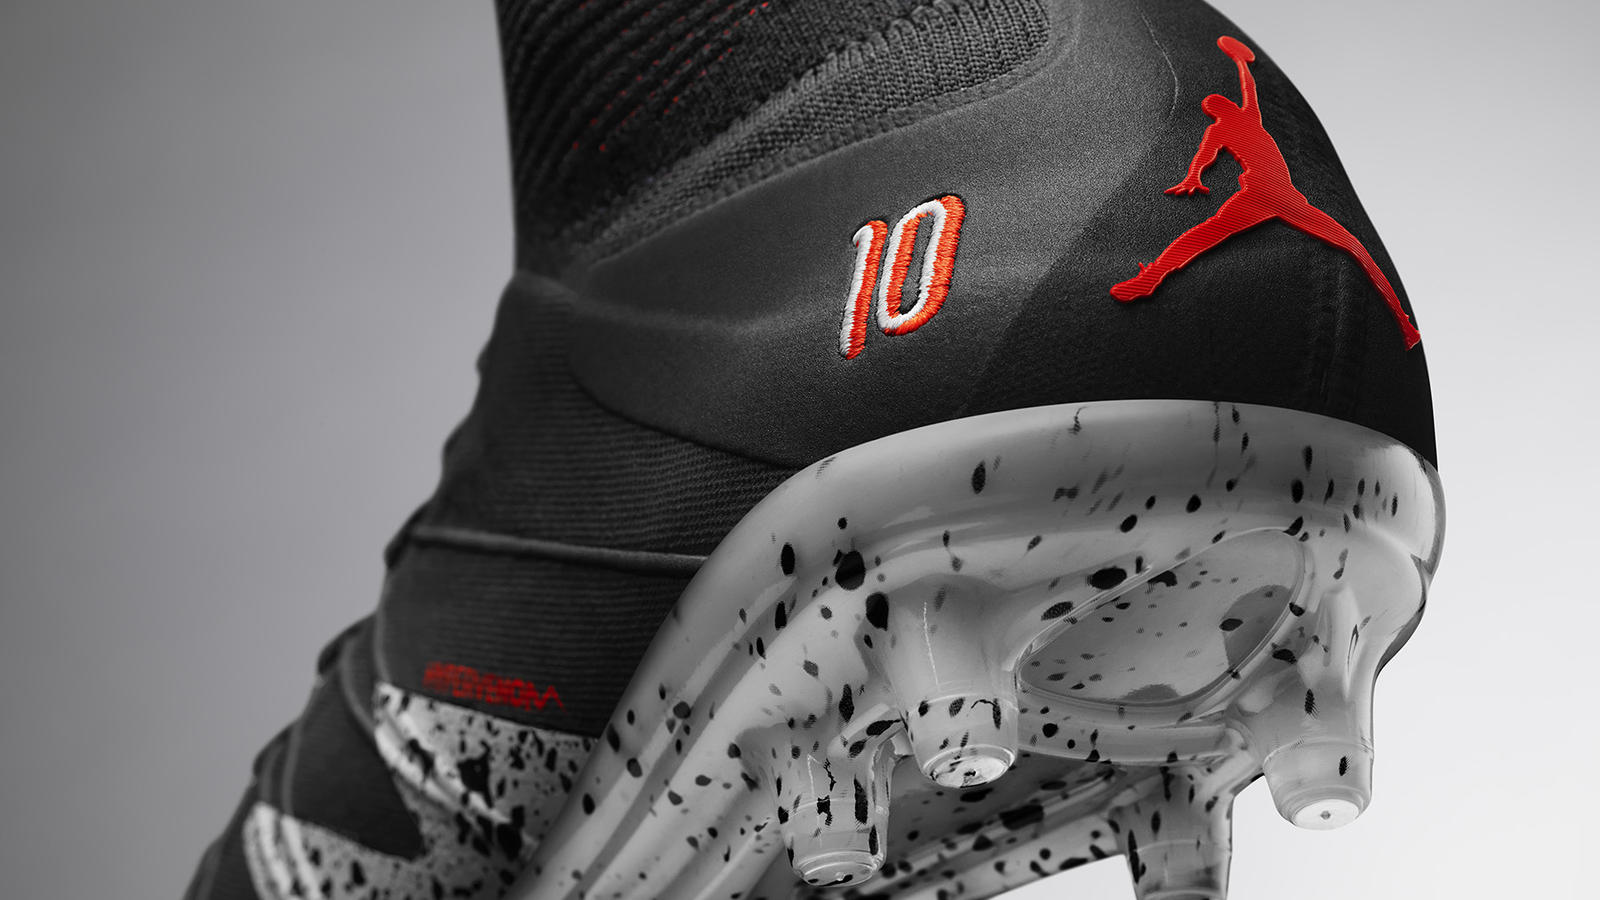 Jordan Njr X News Collection Nike qMVzSUp